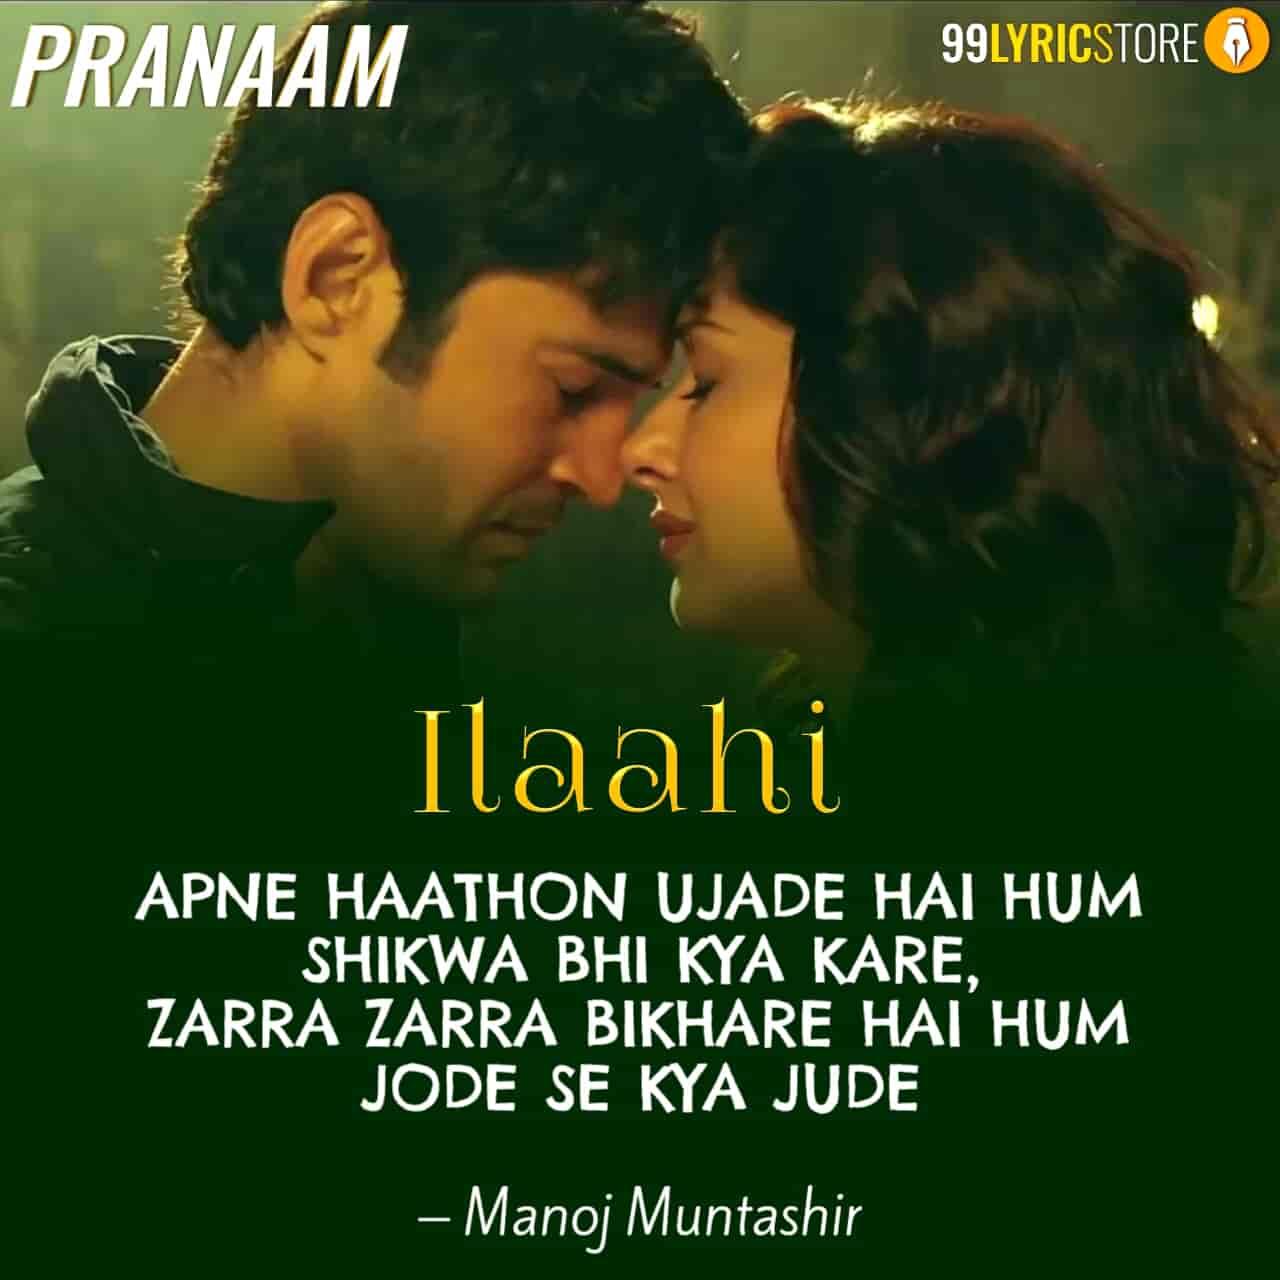 Ilaahi Lyrics song sung by Sonu Nigam from movie Pranaam